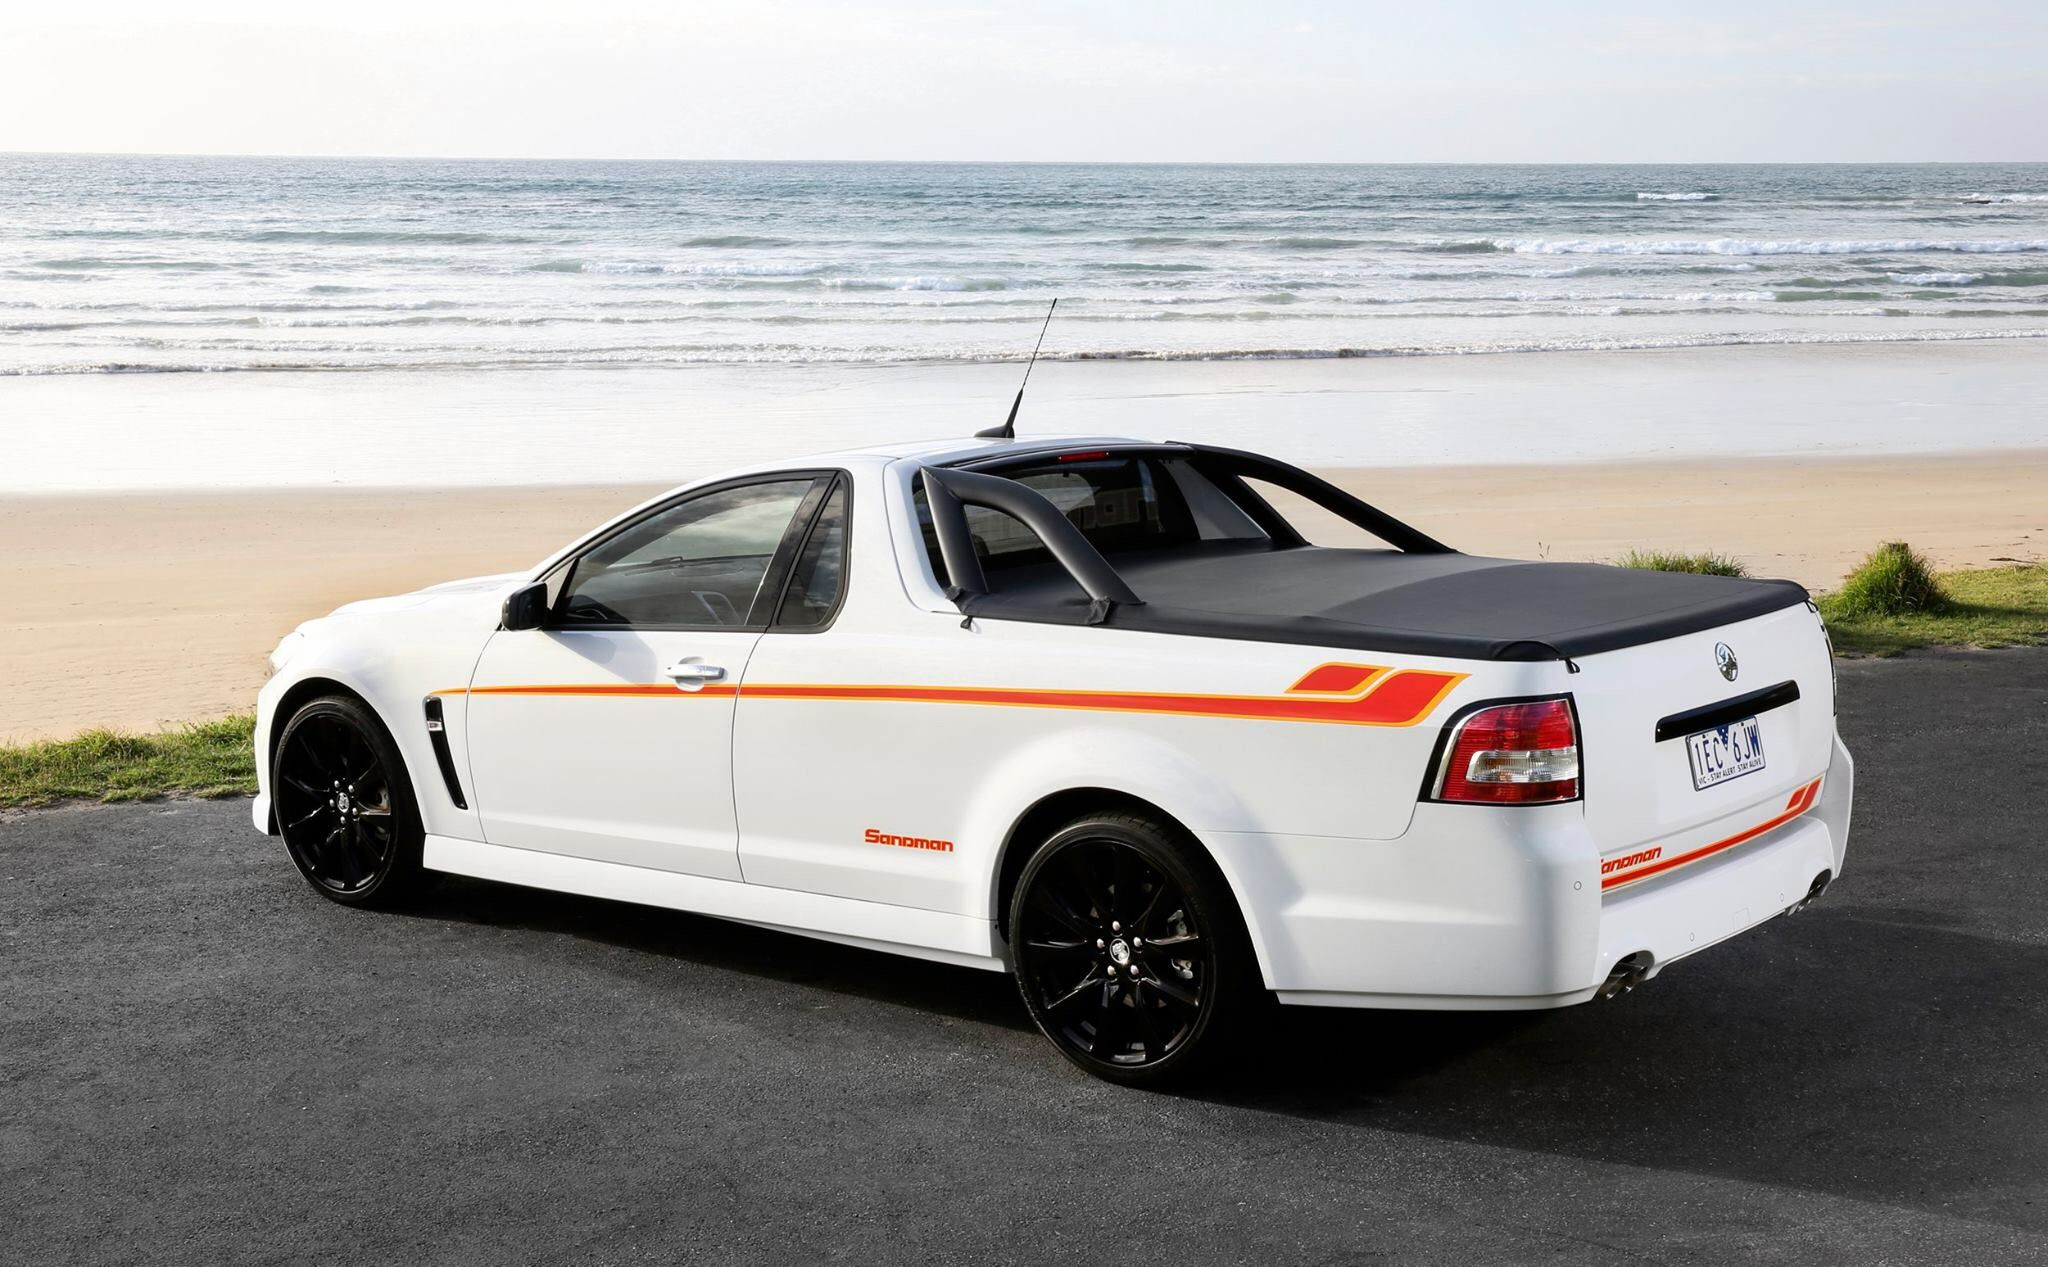 Holden Sandman Australian cars, Cars, Used cars